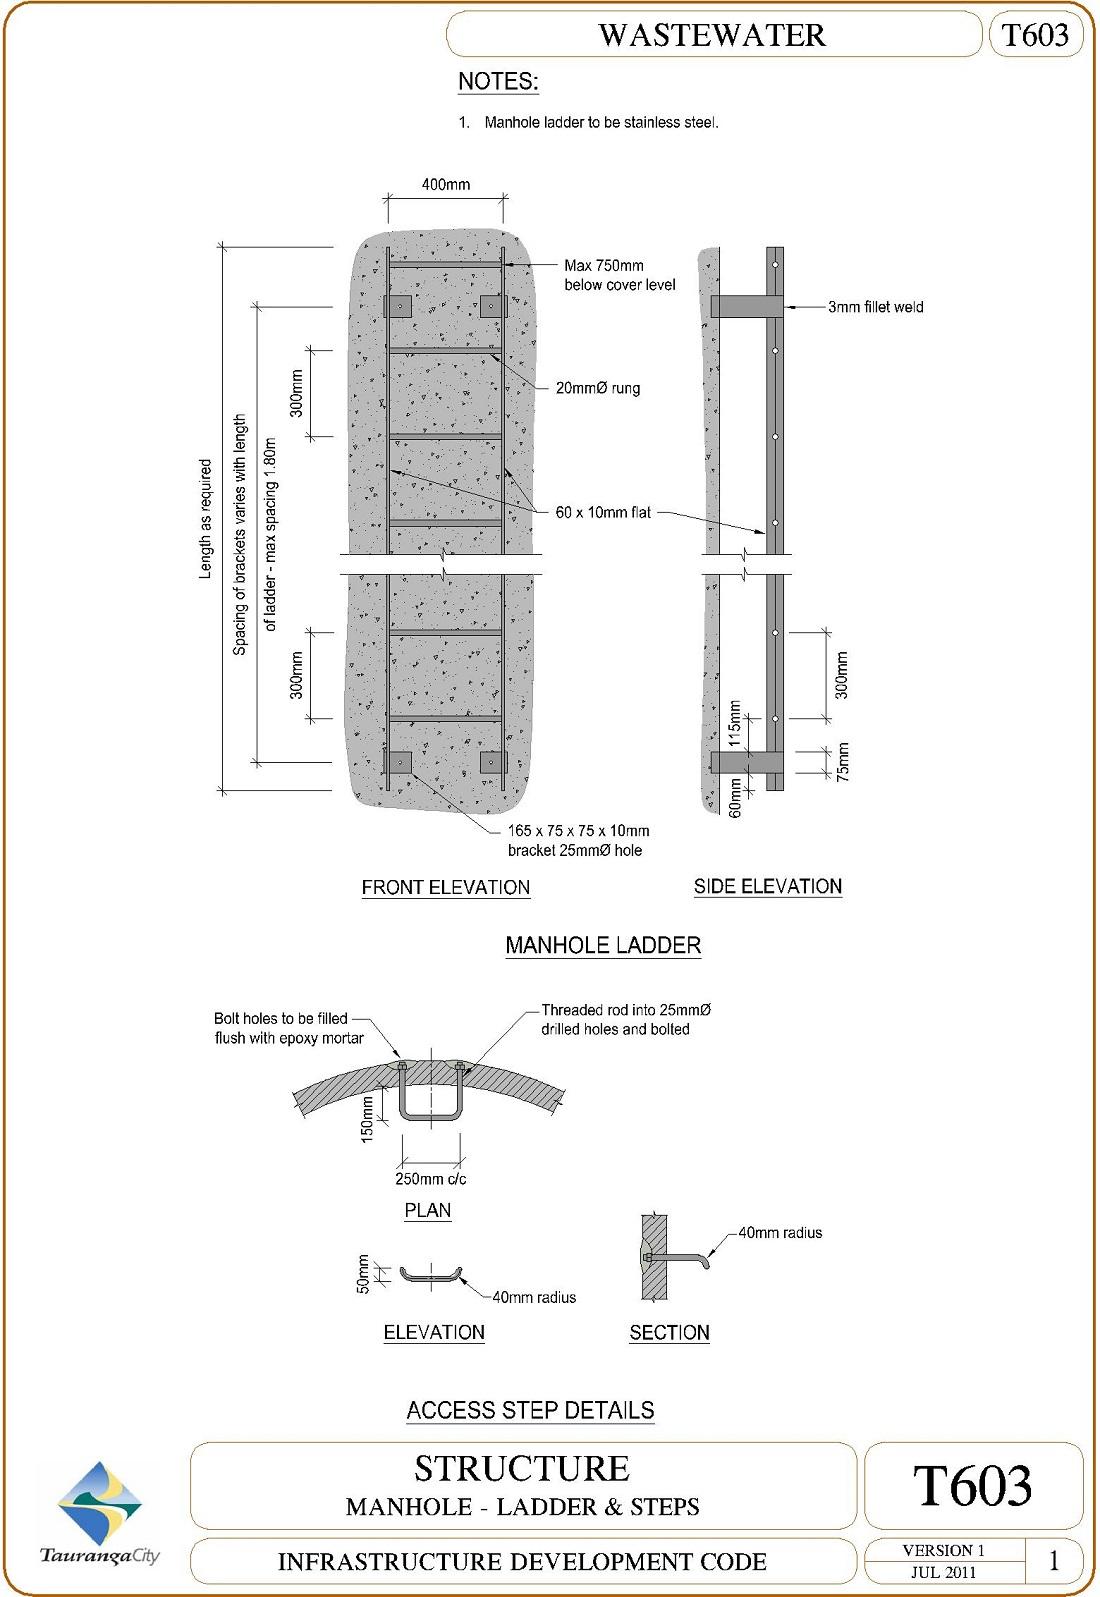 Manhole - Ladder and Steps